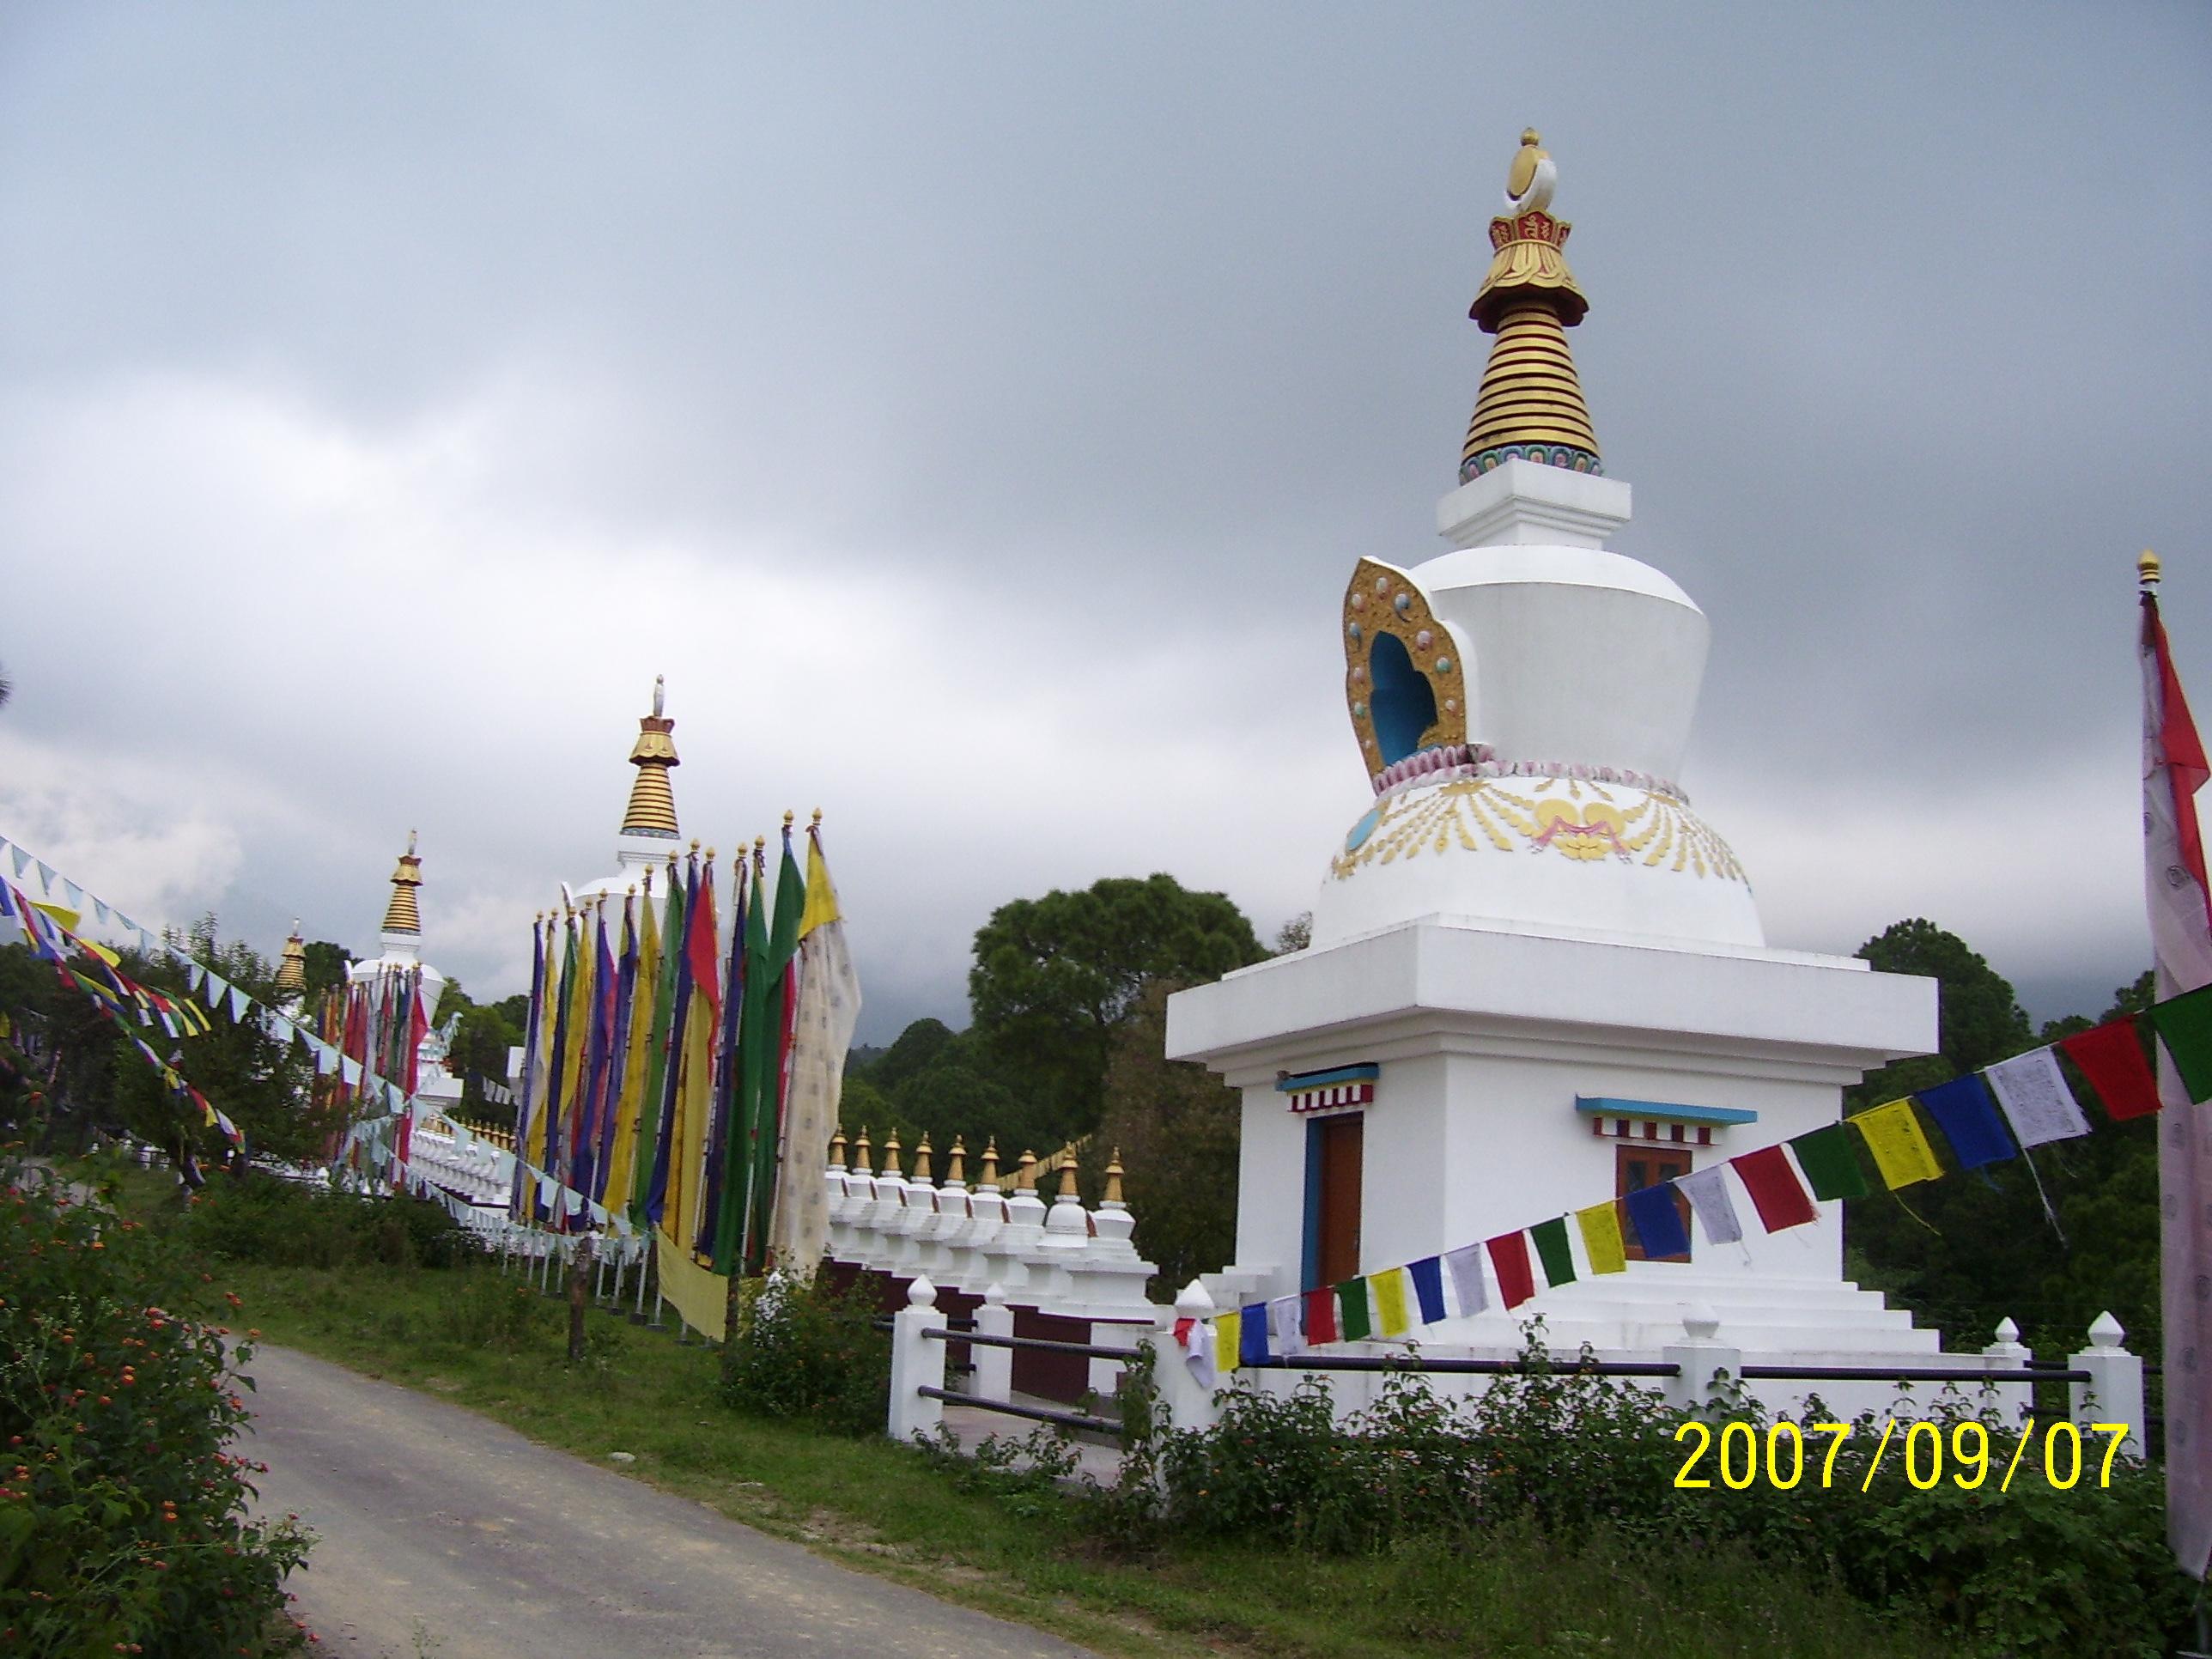 Palpung Sherab Ling Monastery